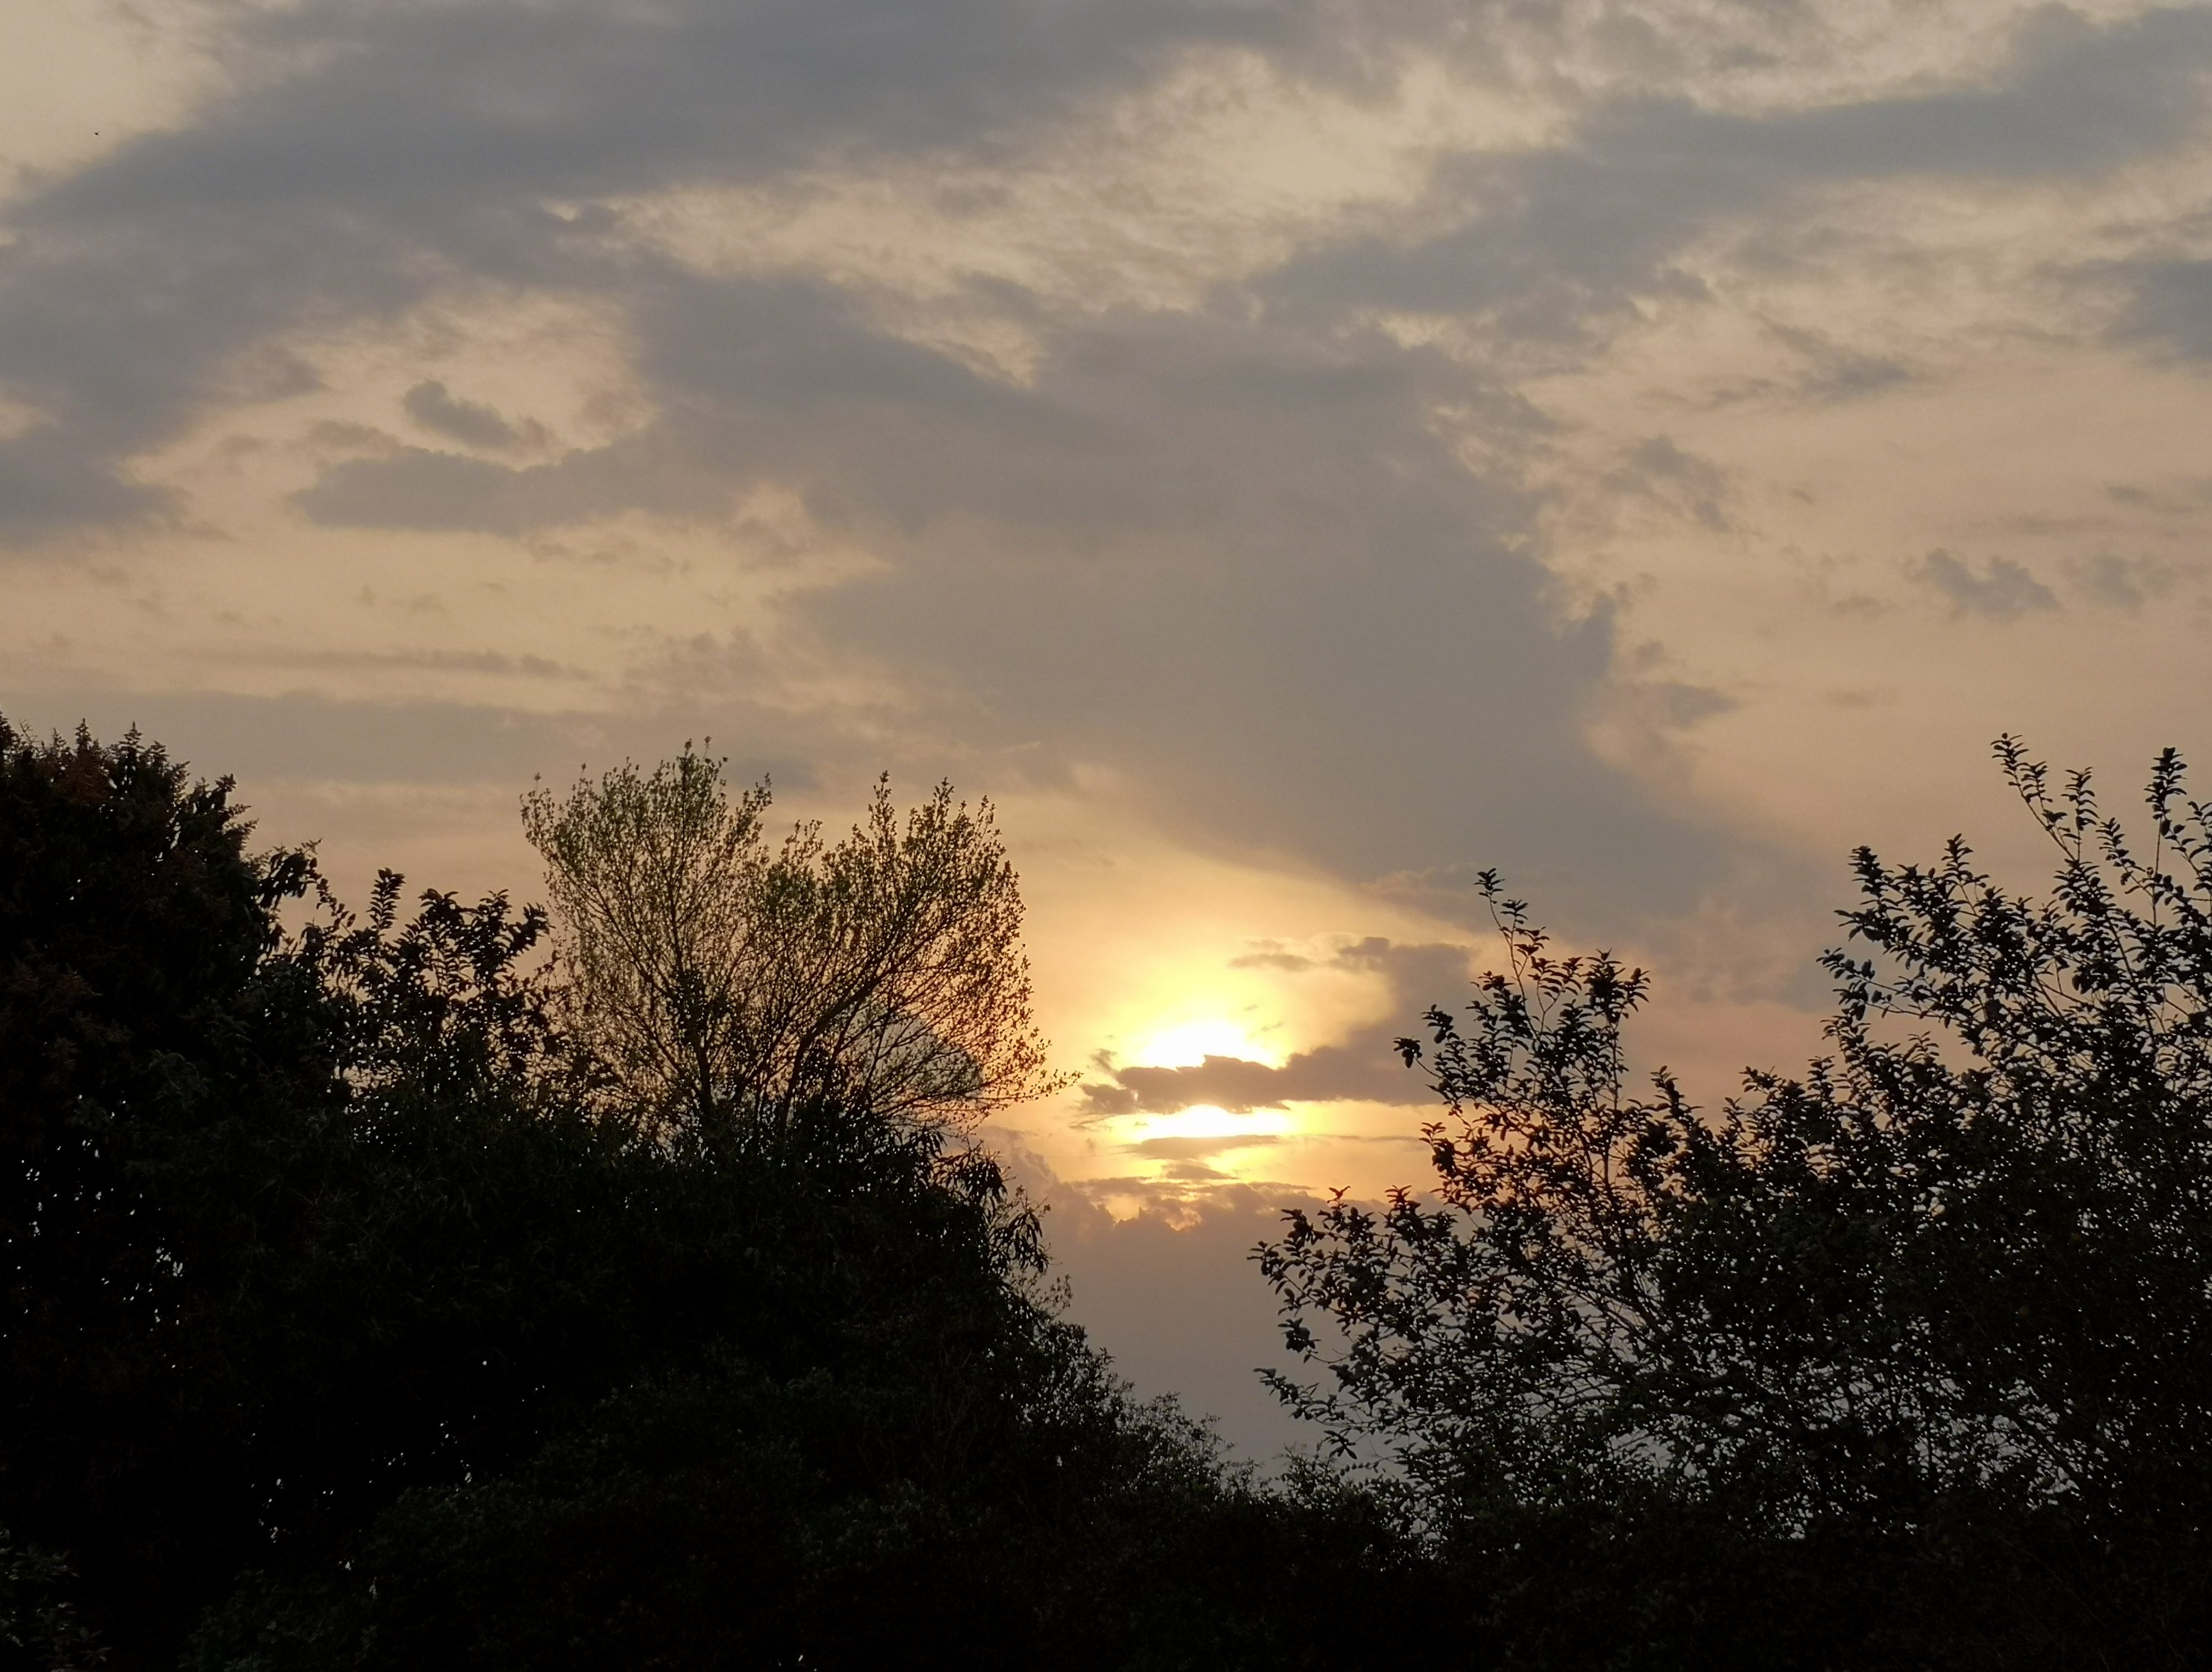 clima ambiente nubes sol calor calido humo bruma 03